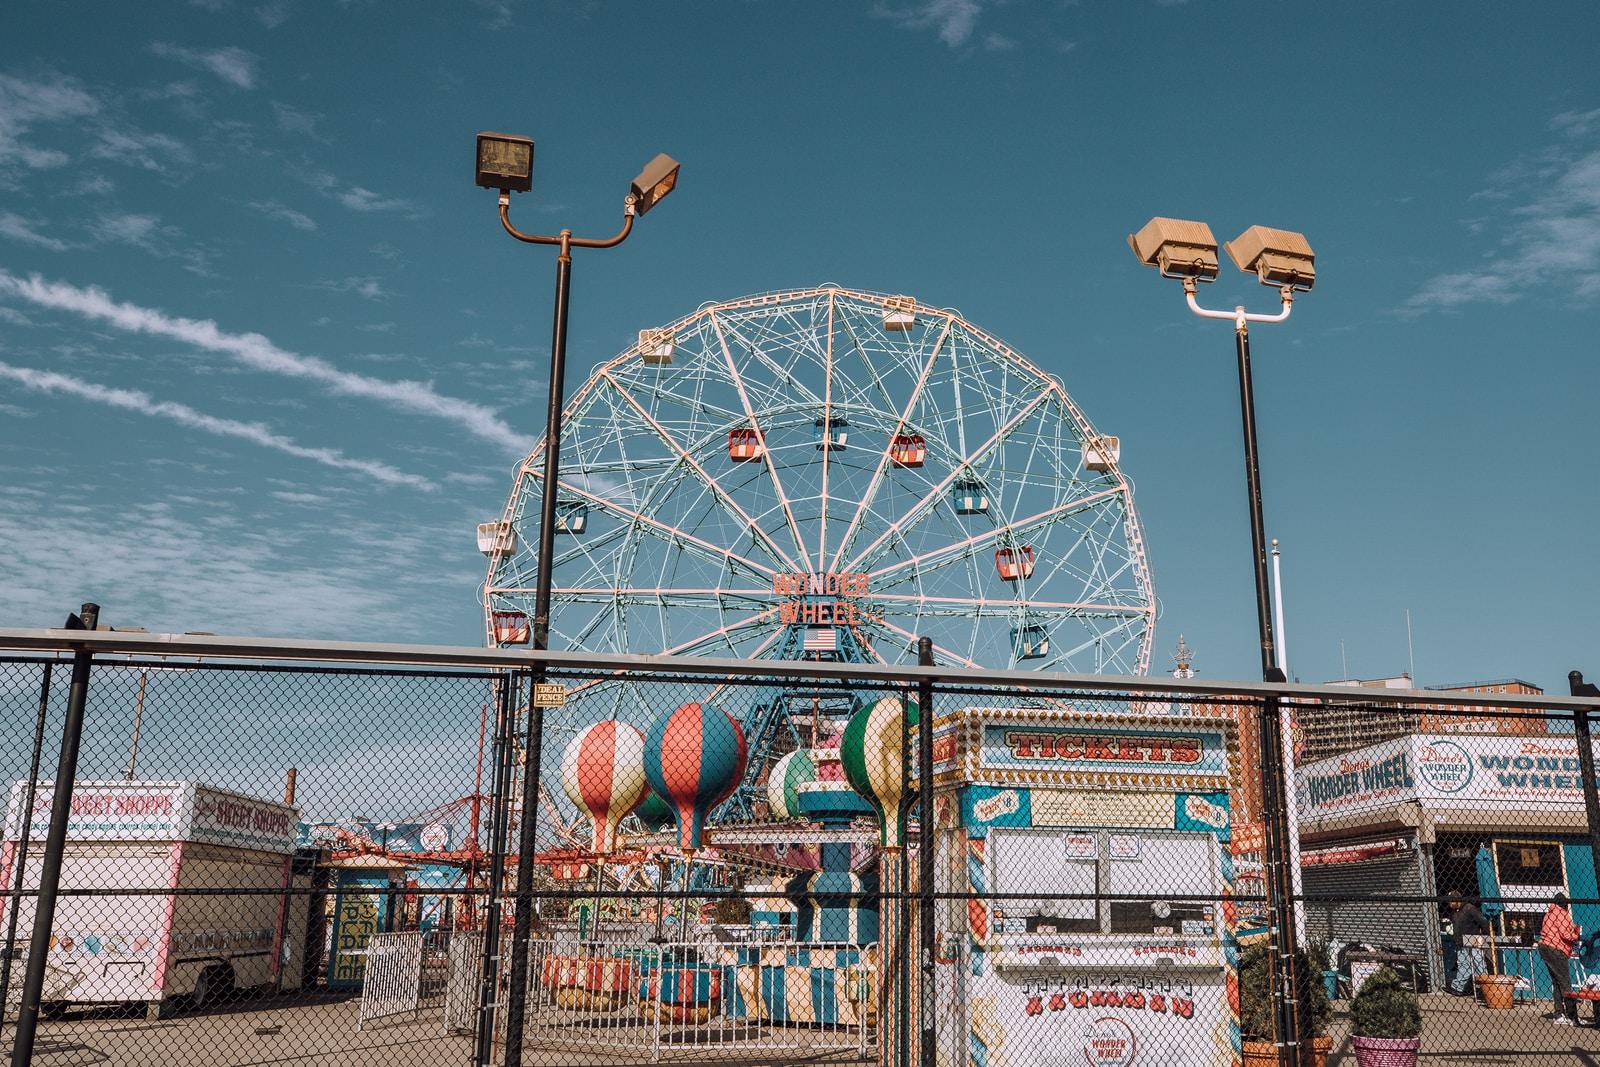 essentials-bring-to-amusement-park